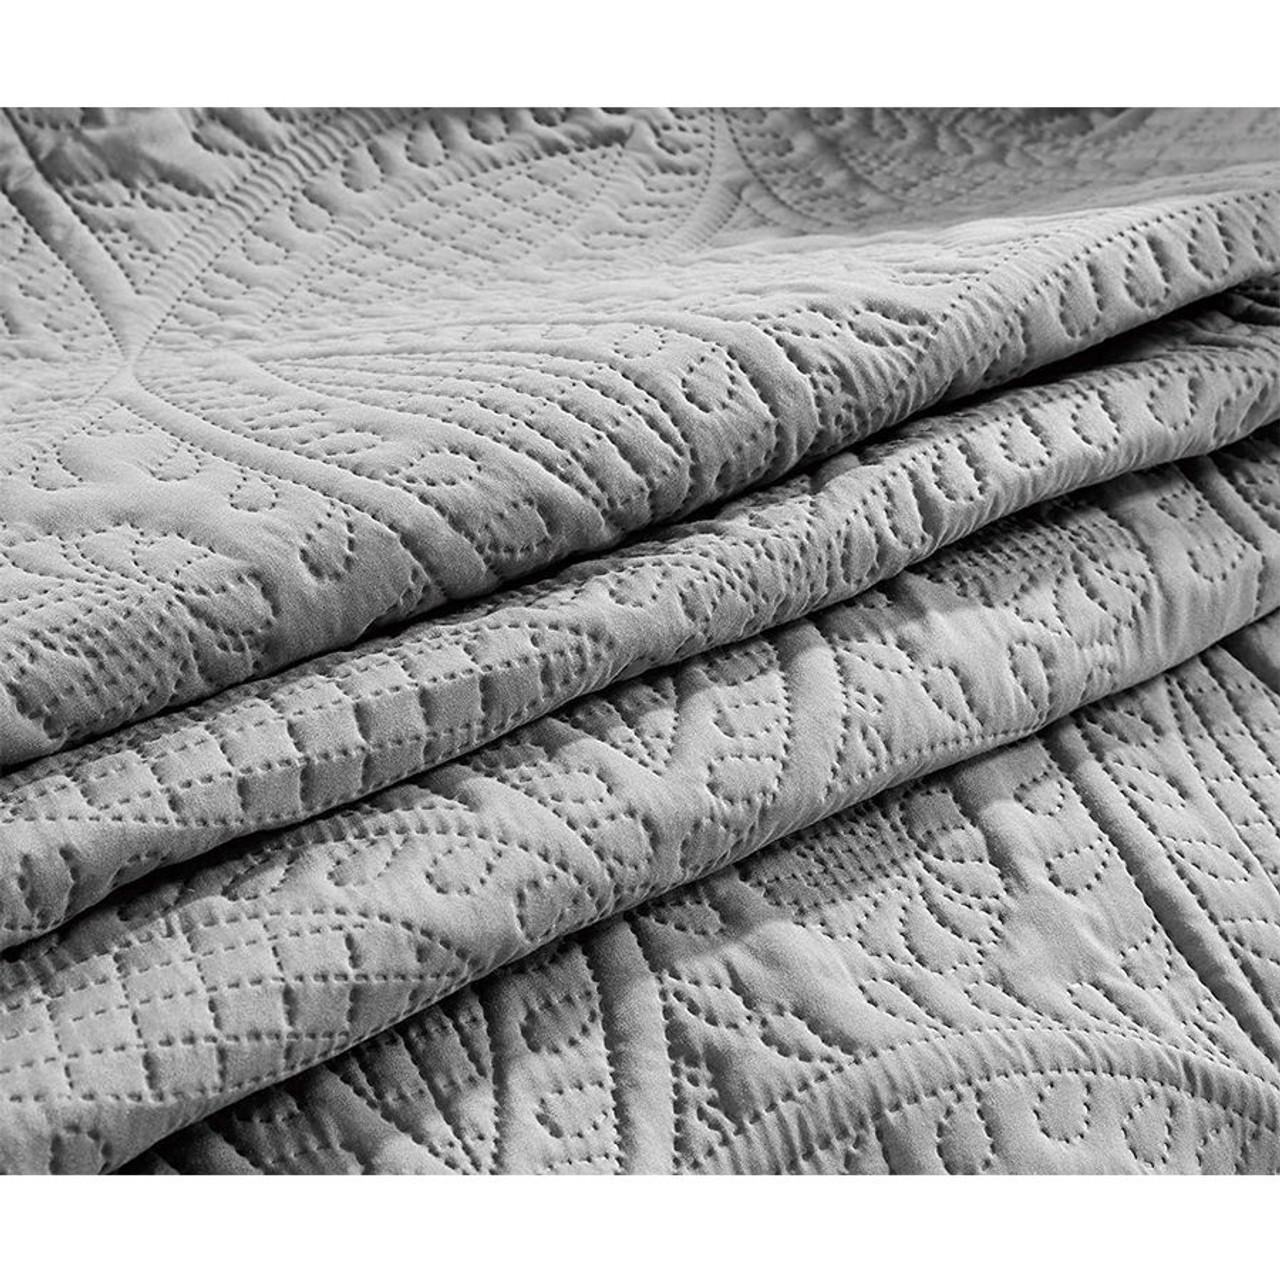 3 Pc Oversized Bedspread Coverlet Set Charcoal Color in USA, California, New York, NY City, Los Angeles, San Francisco, Pennsylvania, Washington DC, Virginia, Maryland